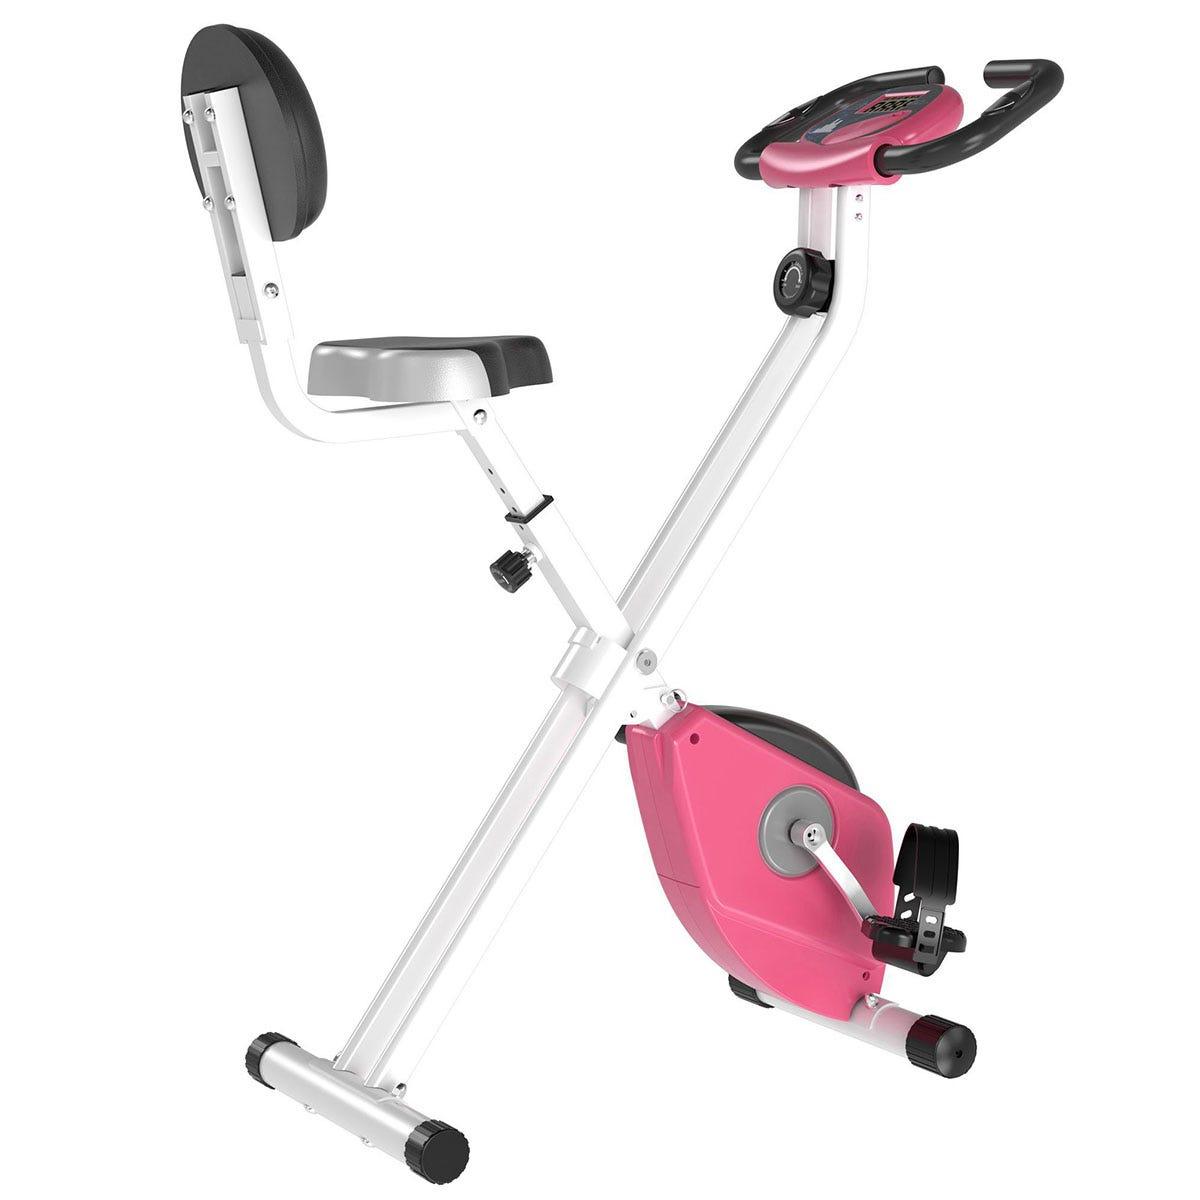 HOMCOM Magnetic Resistance Exercise Bike Foldable LCD Adjustable Seat Pink